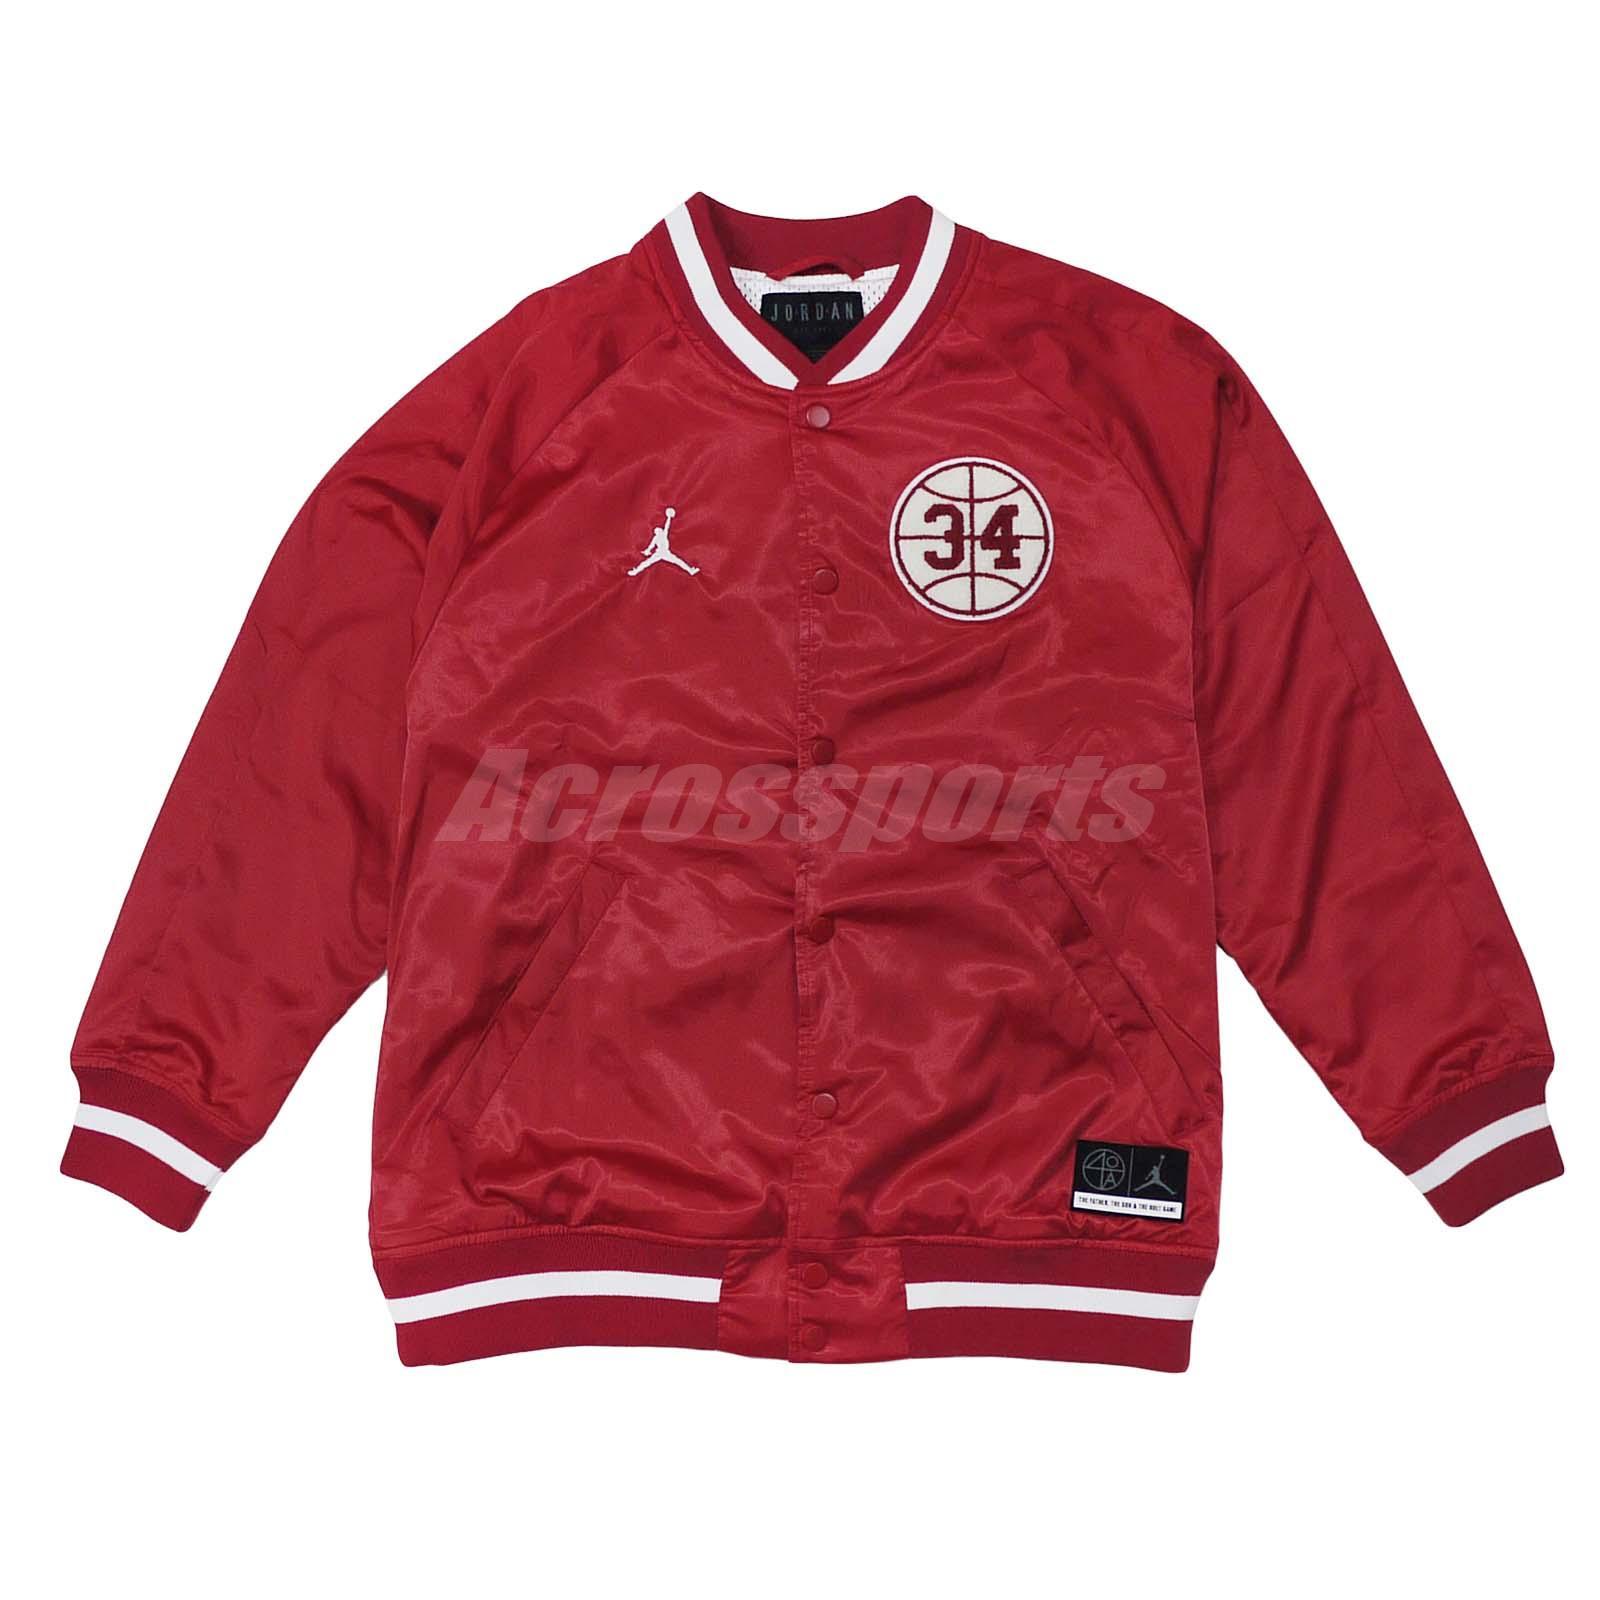 ab0749f1af16b3 Nike Jordan He Got Game Satin Baseball Jacket Bomber Air Gym Red AR1170-688